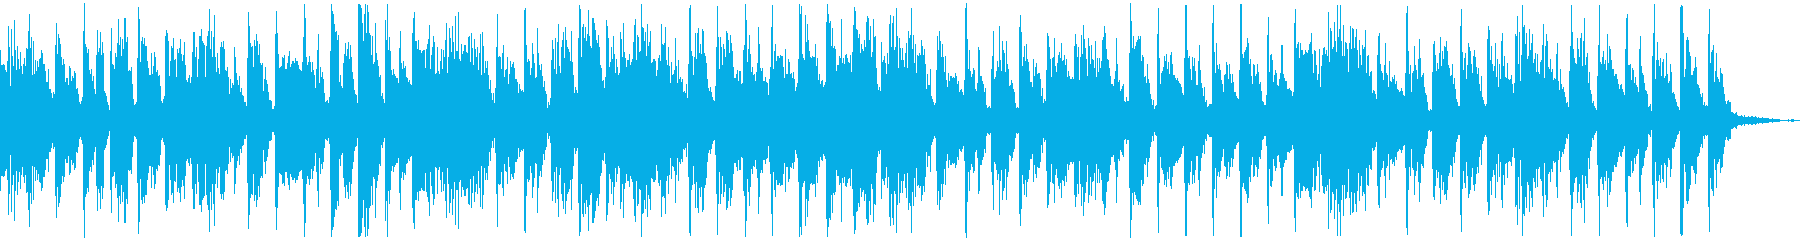 【CM】クールなエレクトロBGM・13の再生済みの波形